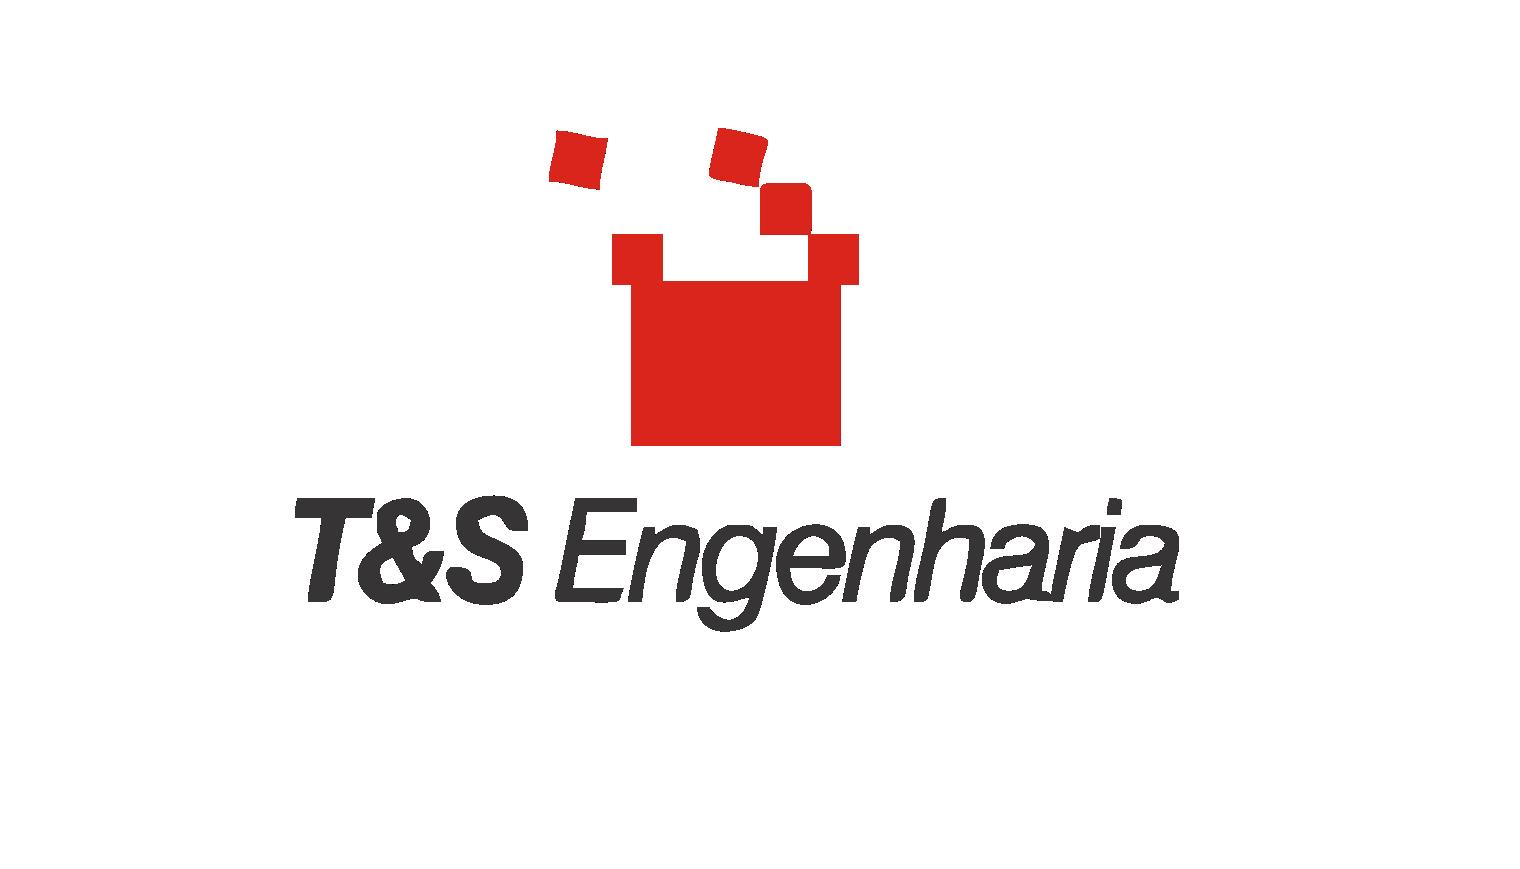 Ts Engenharia